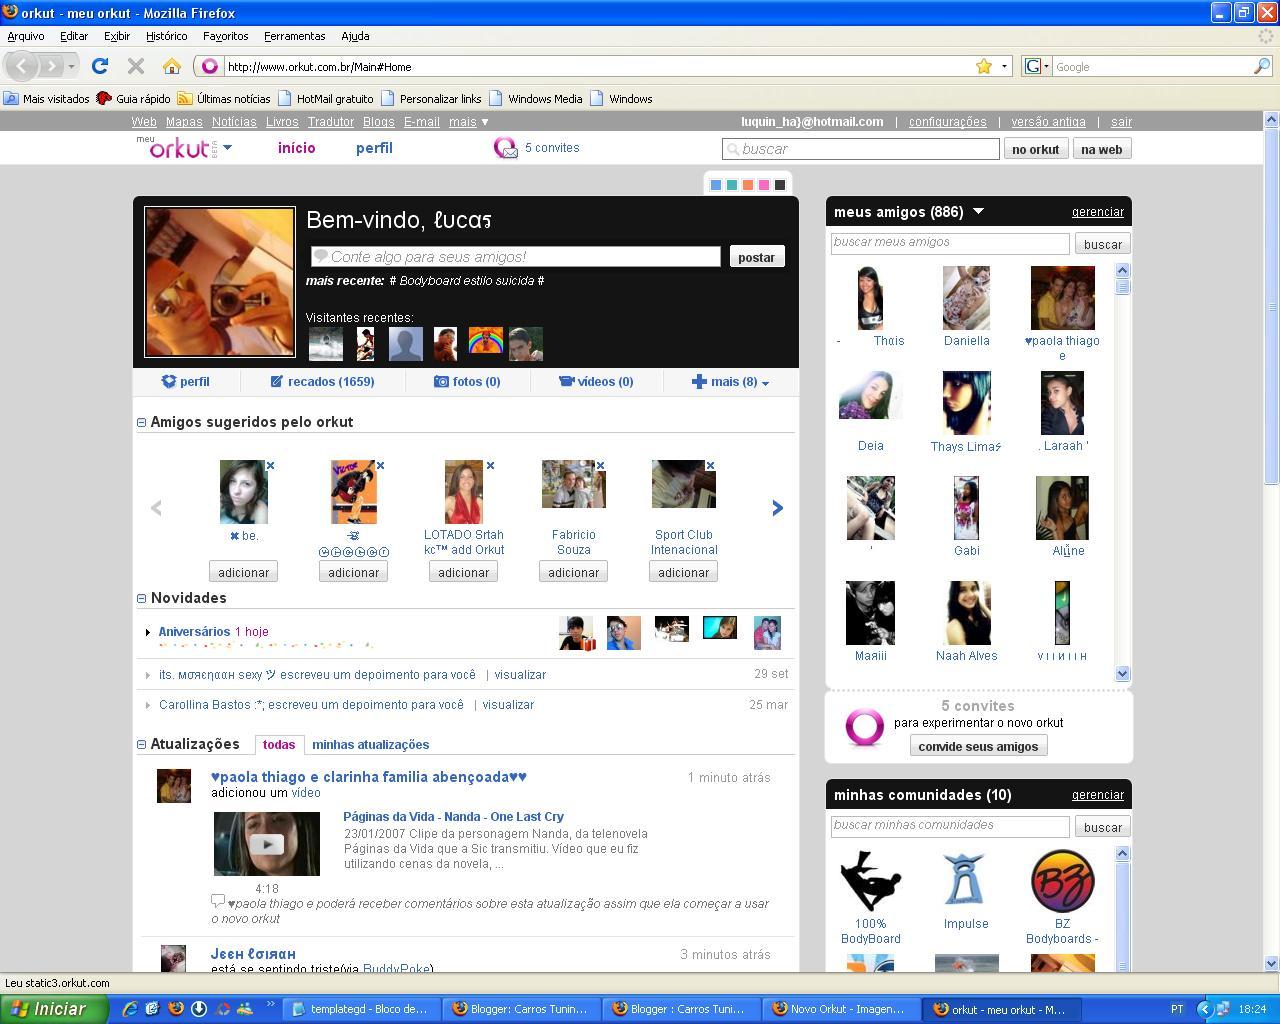 Como desbloquear fotos do orkut 2011 69